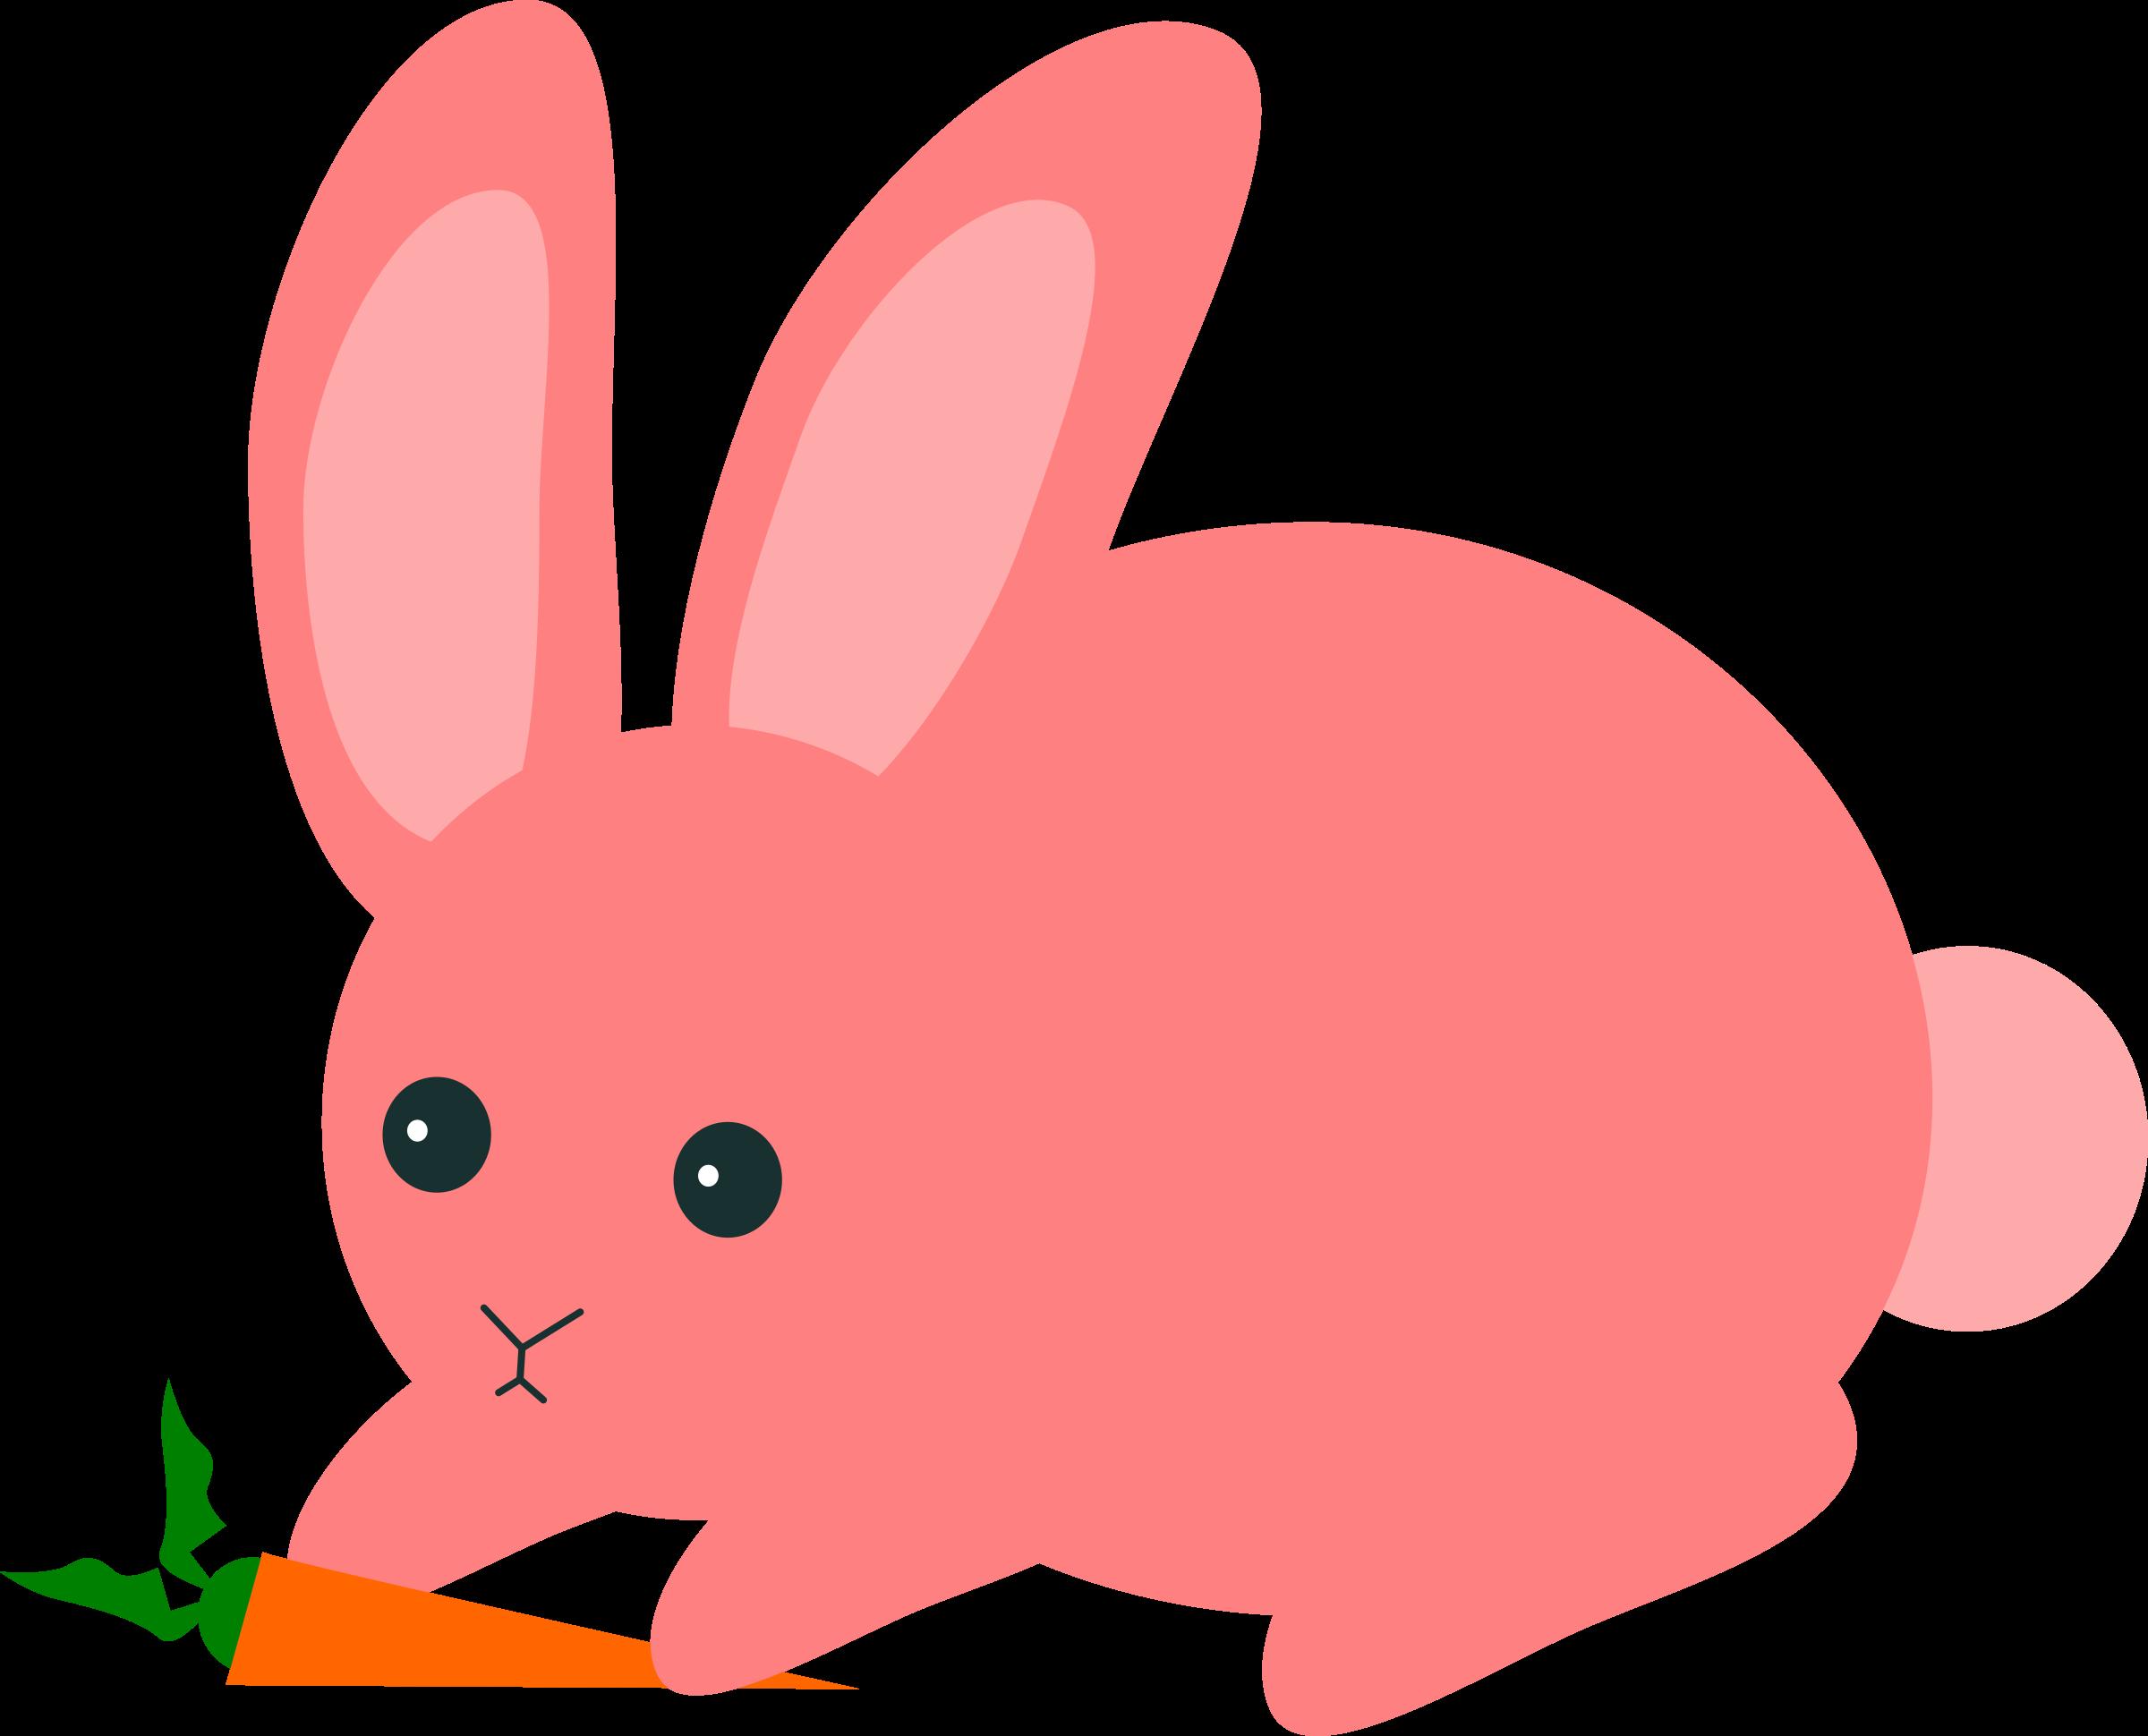 Pink big image png. Clipart rabbit carrot